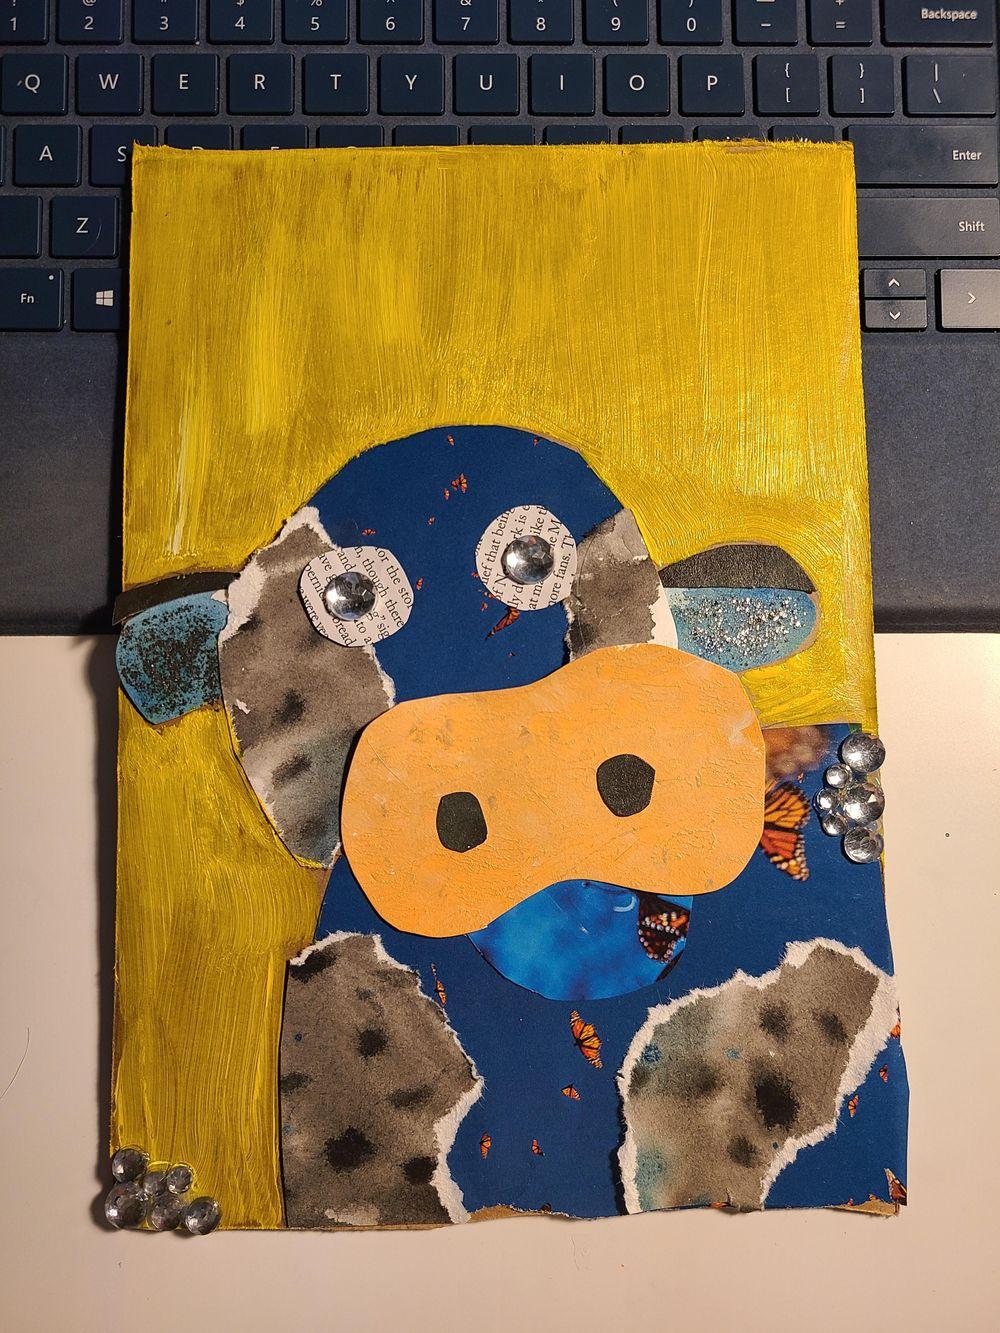 Beautiful Bovine - image 1 - student project